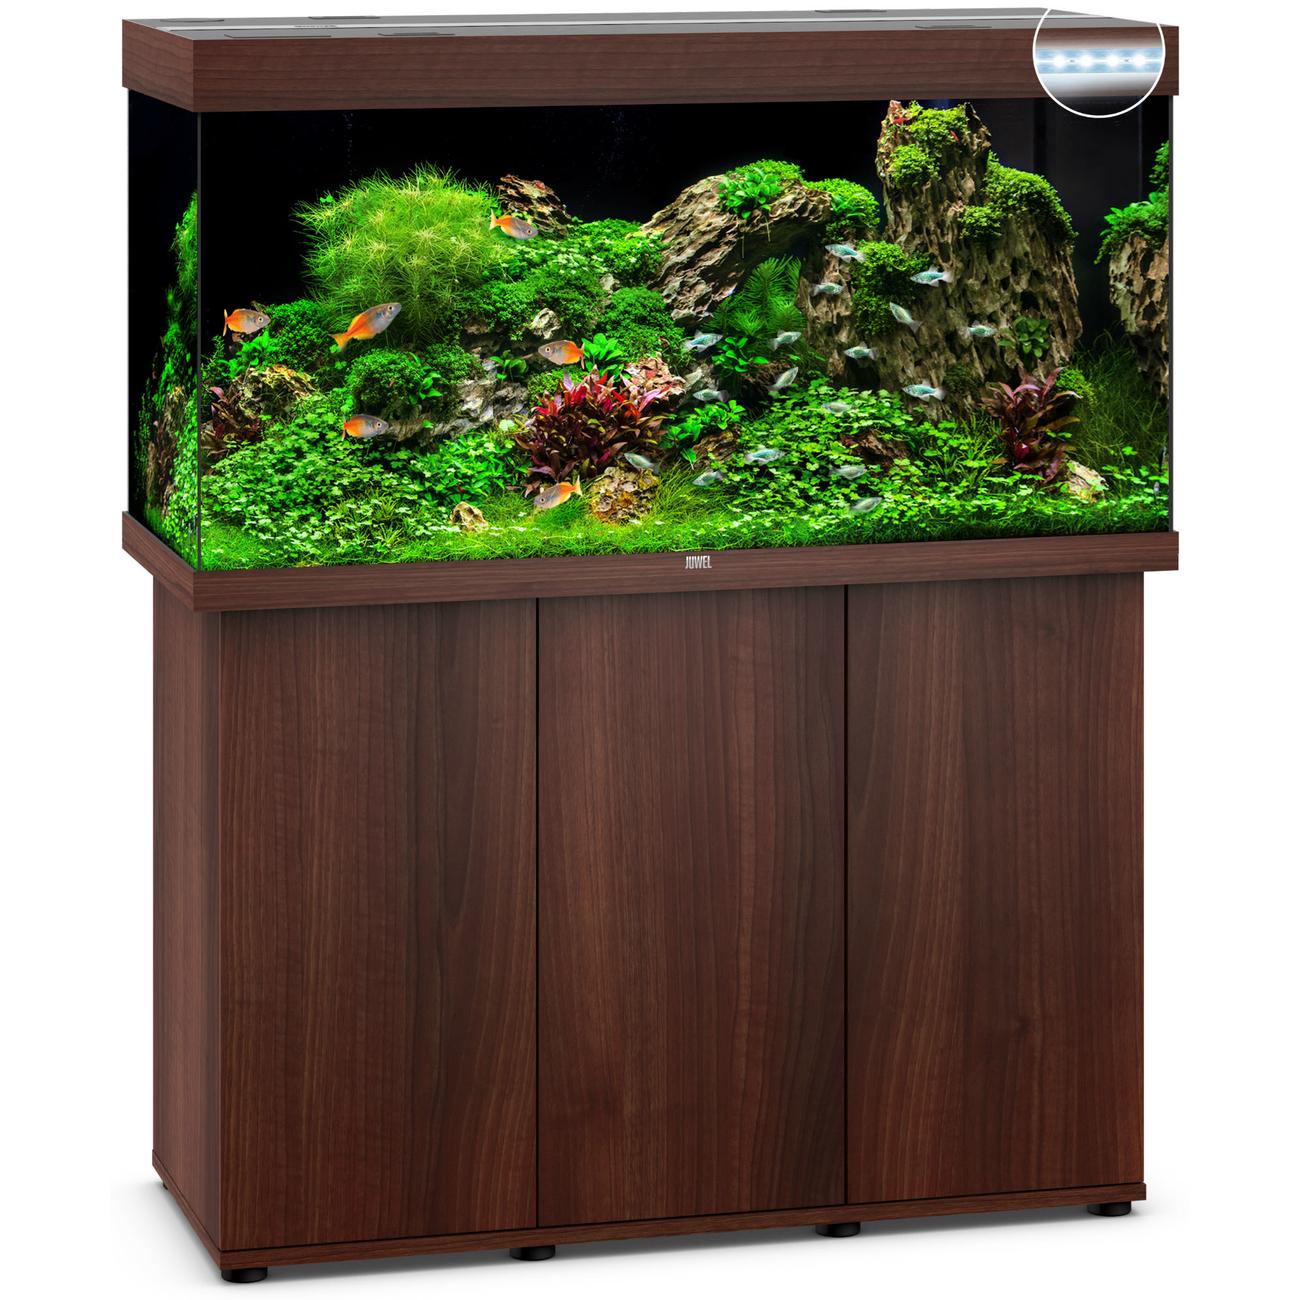 JUWEL RIO 350 LED Aquarium mit Unterschrank, 121 x 51 x (66+80) cm, dunkles Holz